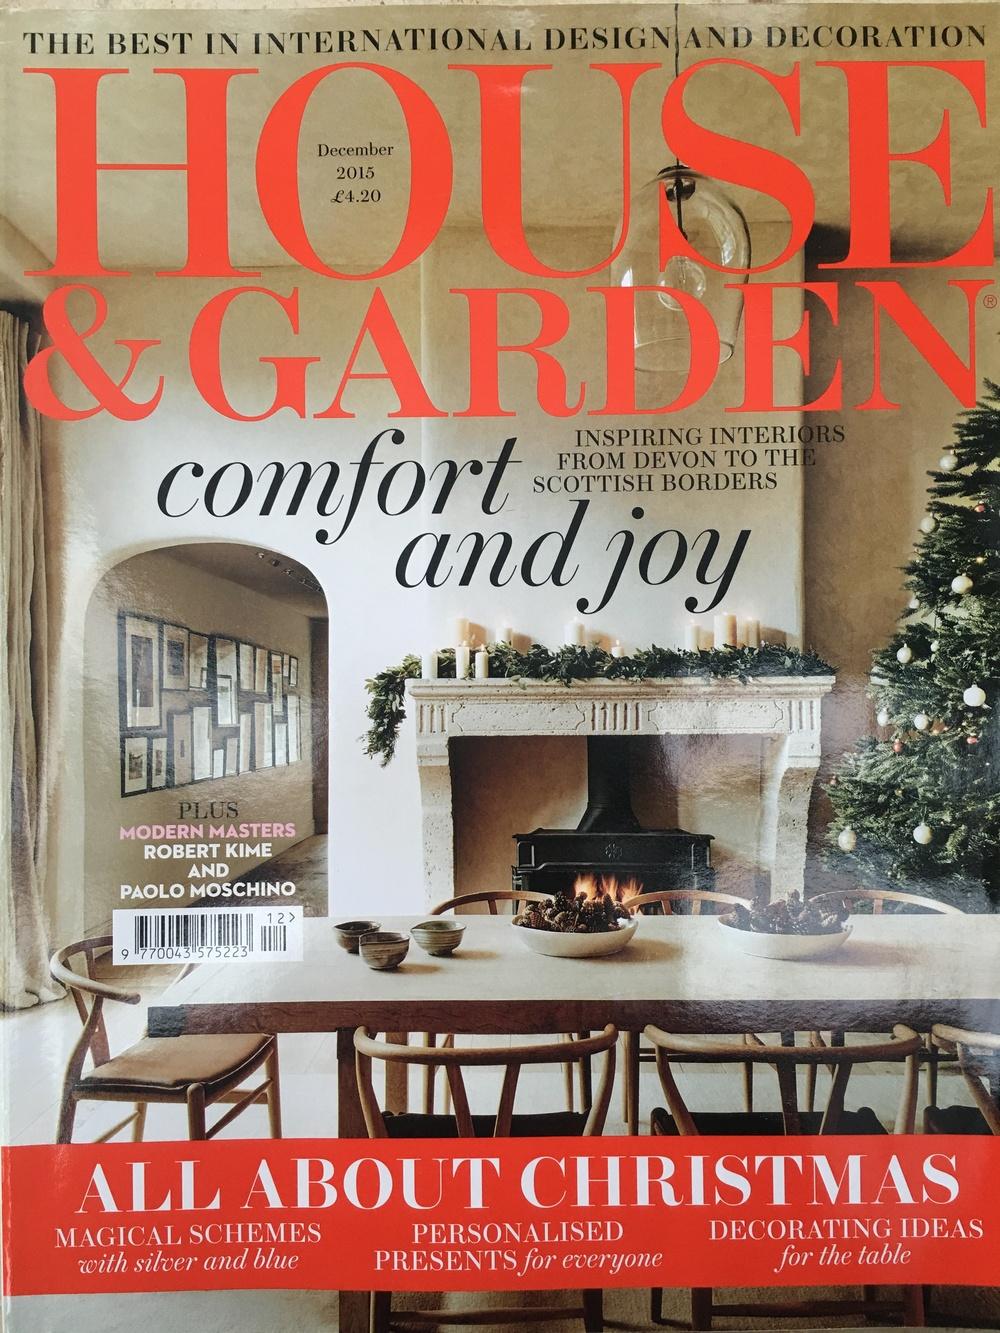 House & Garden December 2015